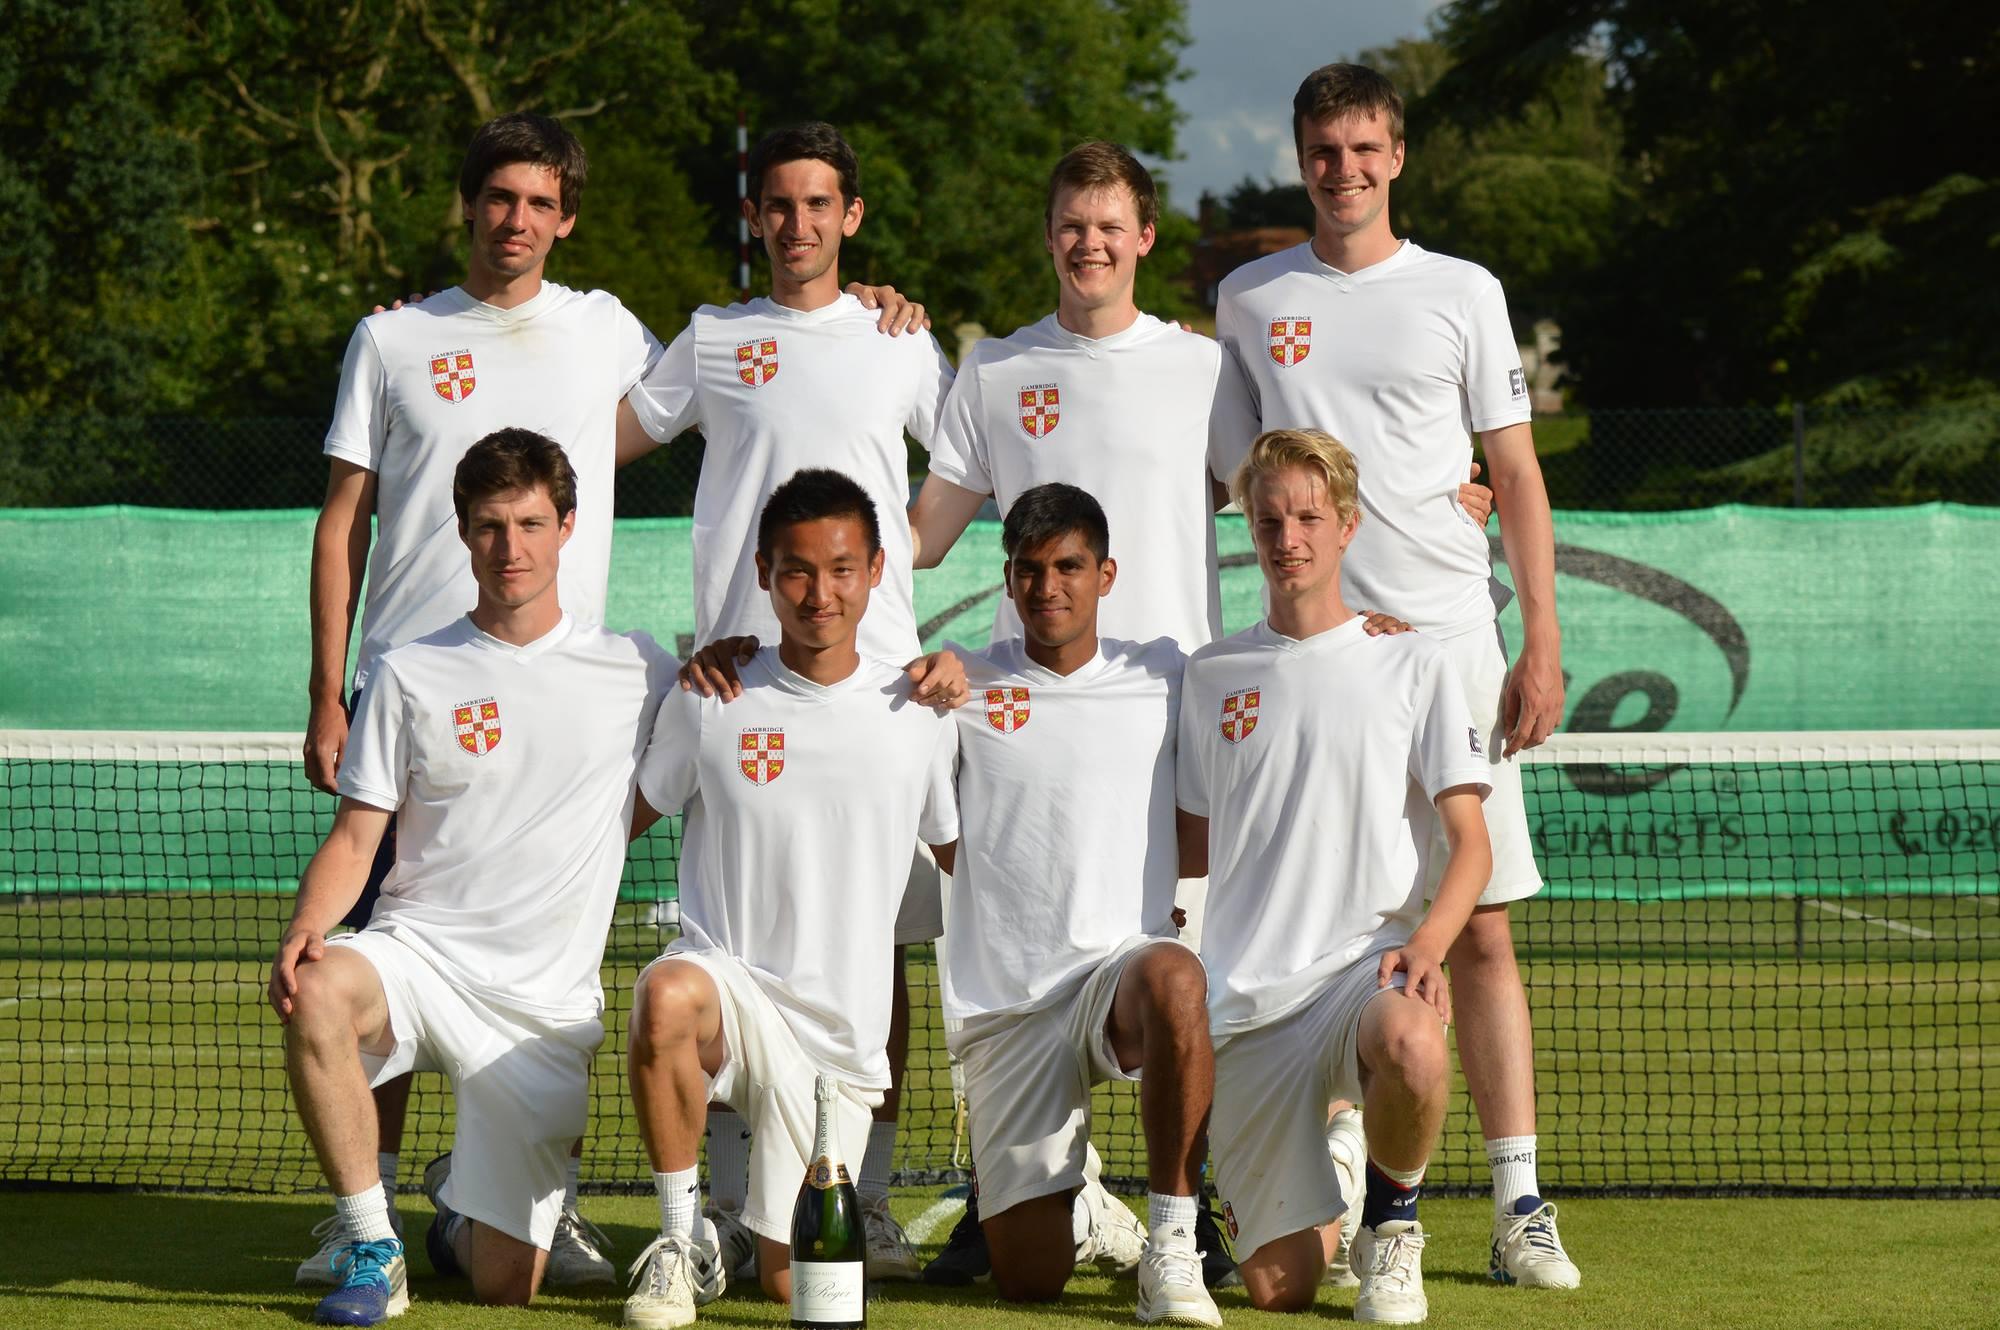 men's tennis m1